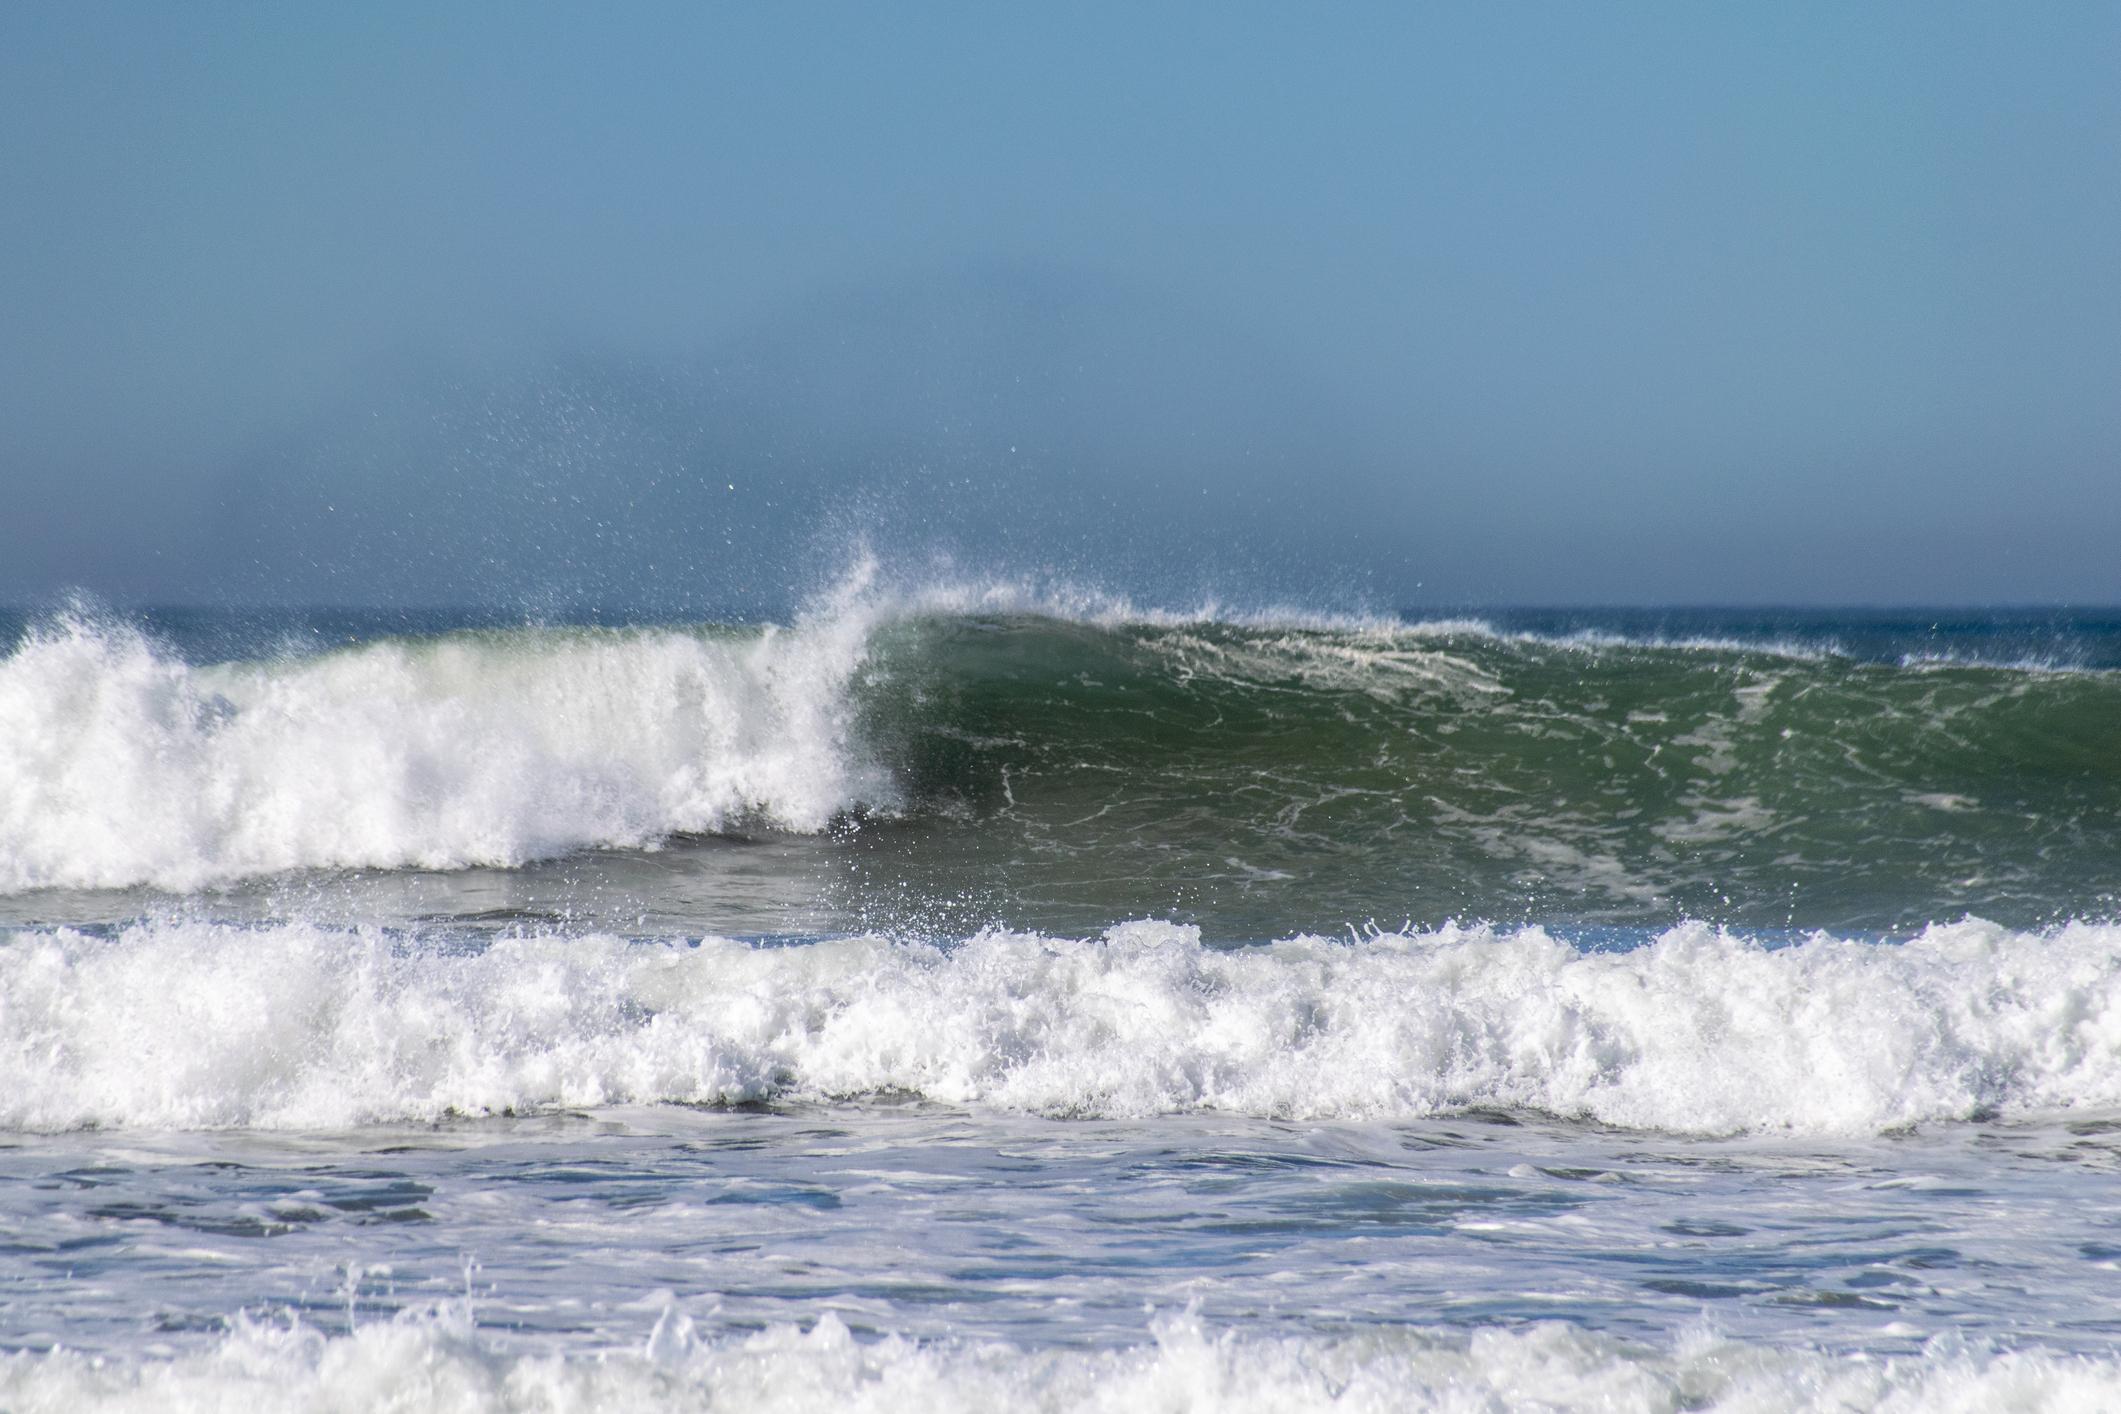 Waves With Wanda Velez at MamaSpace Yoga